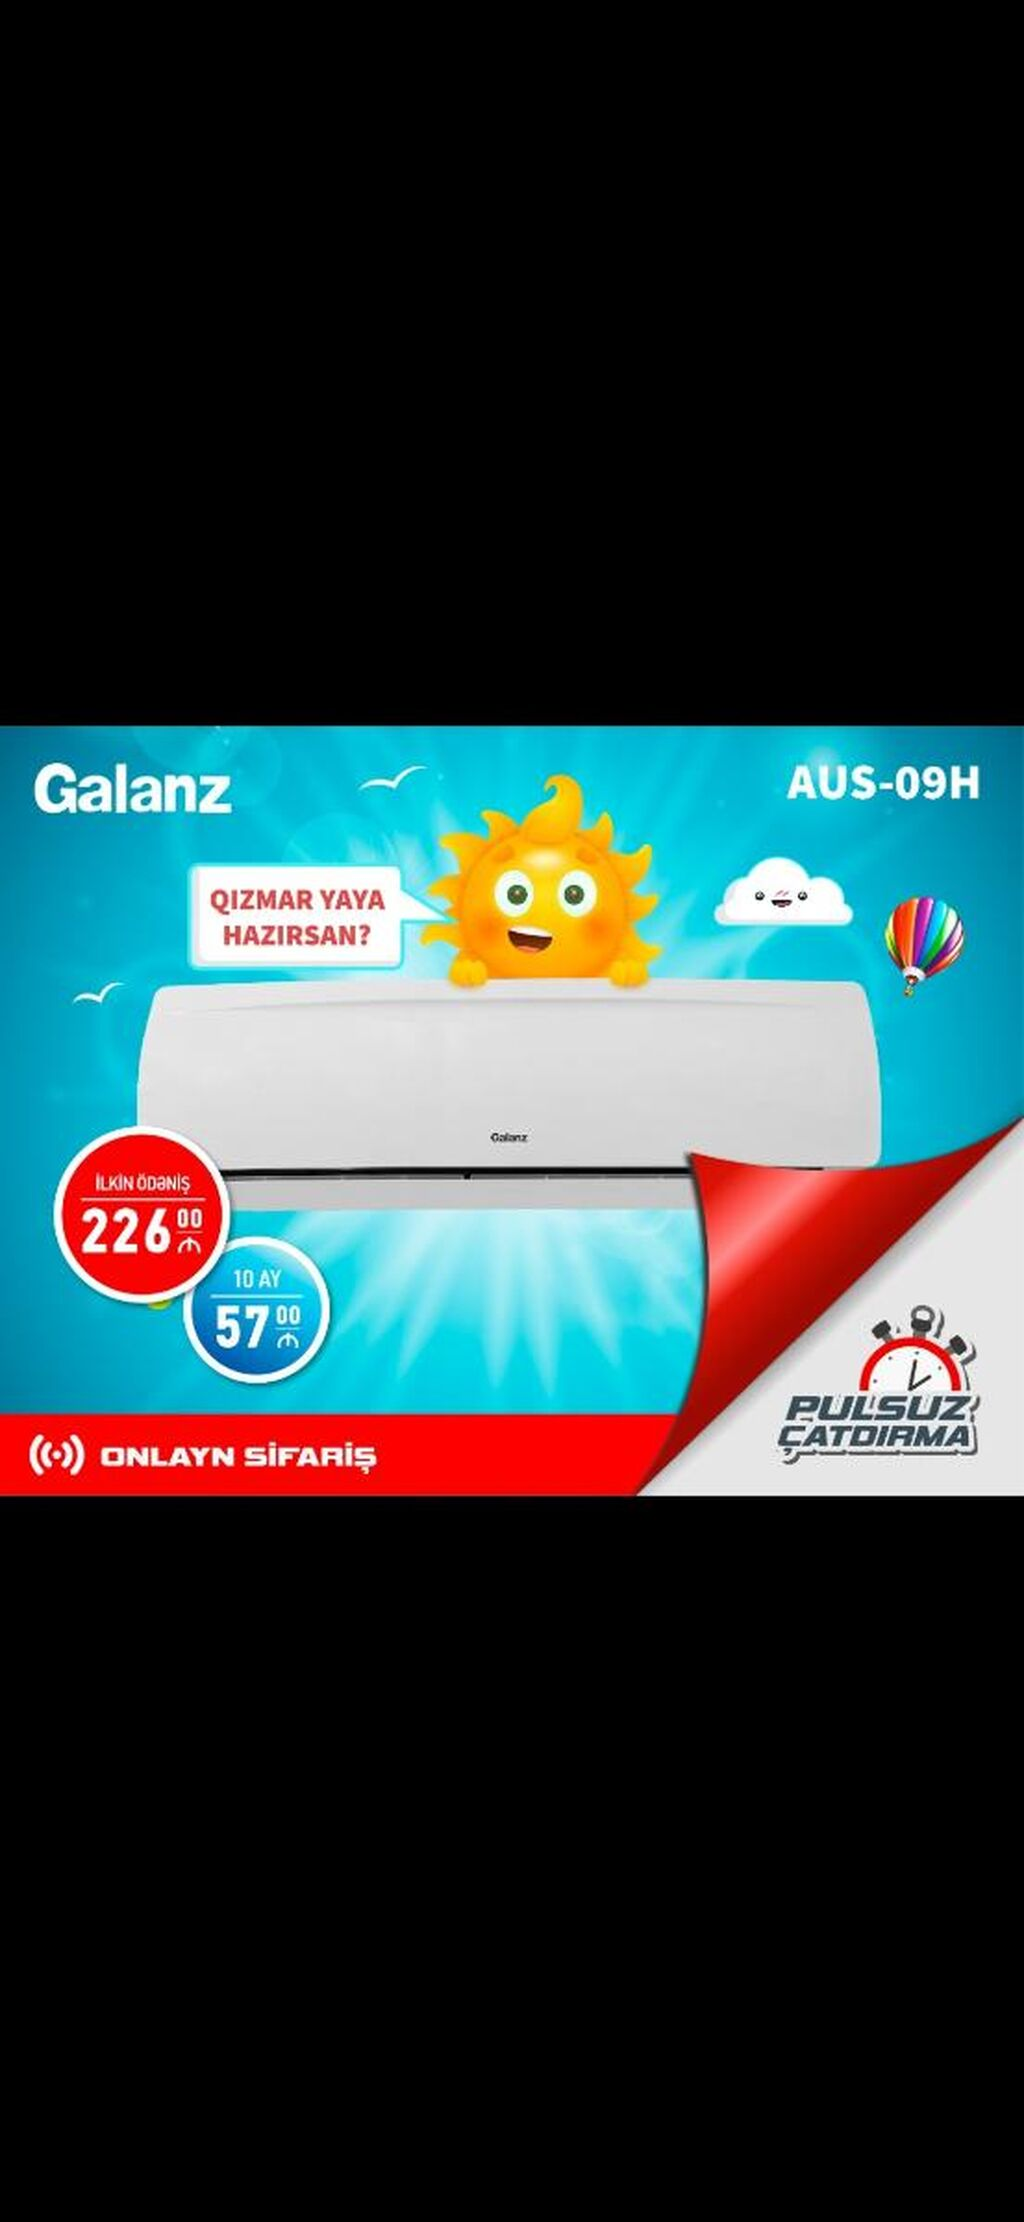 Galanz AUS-09H